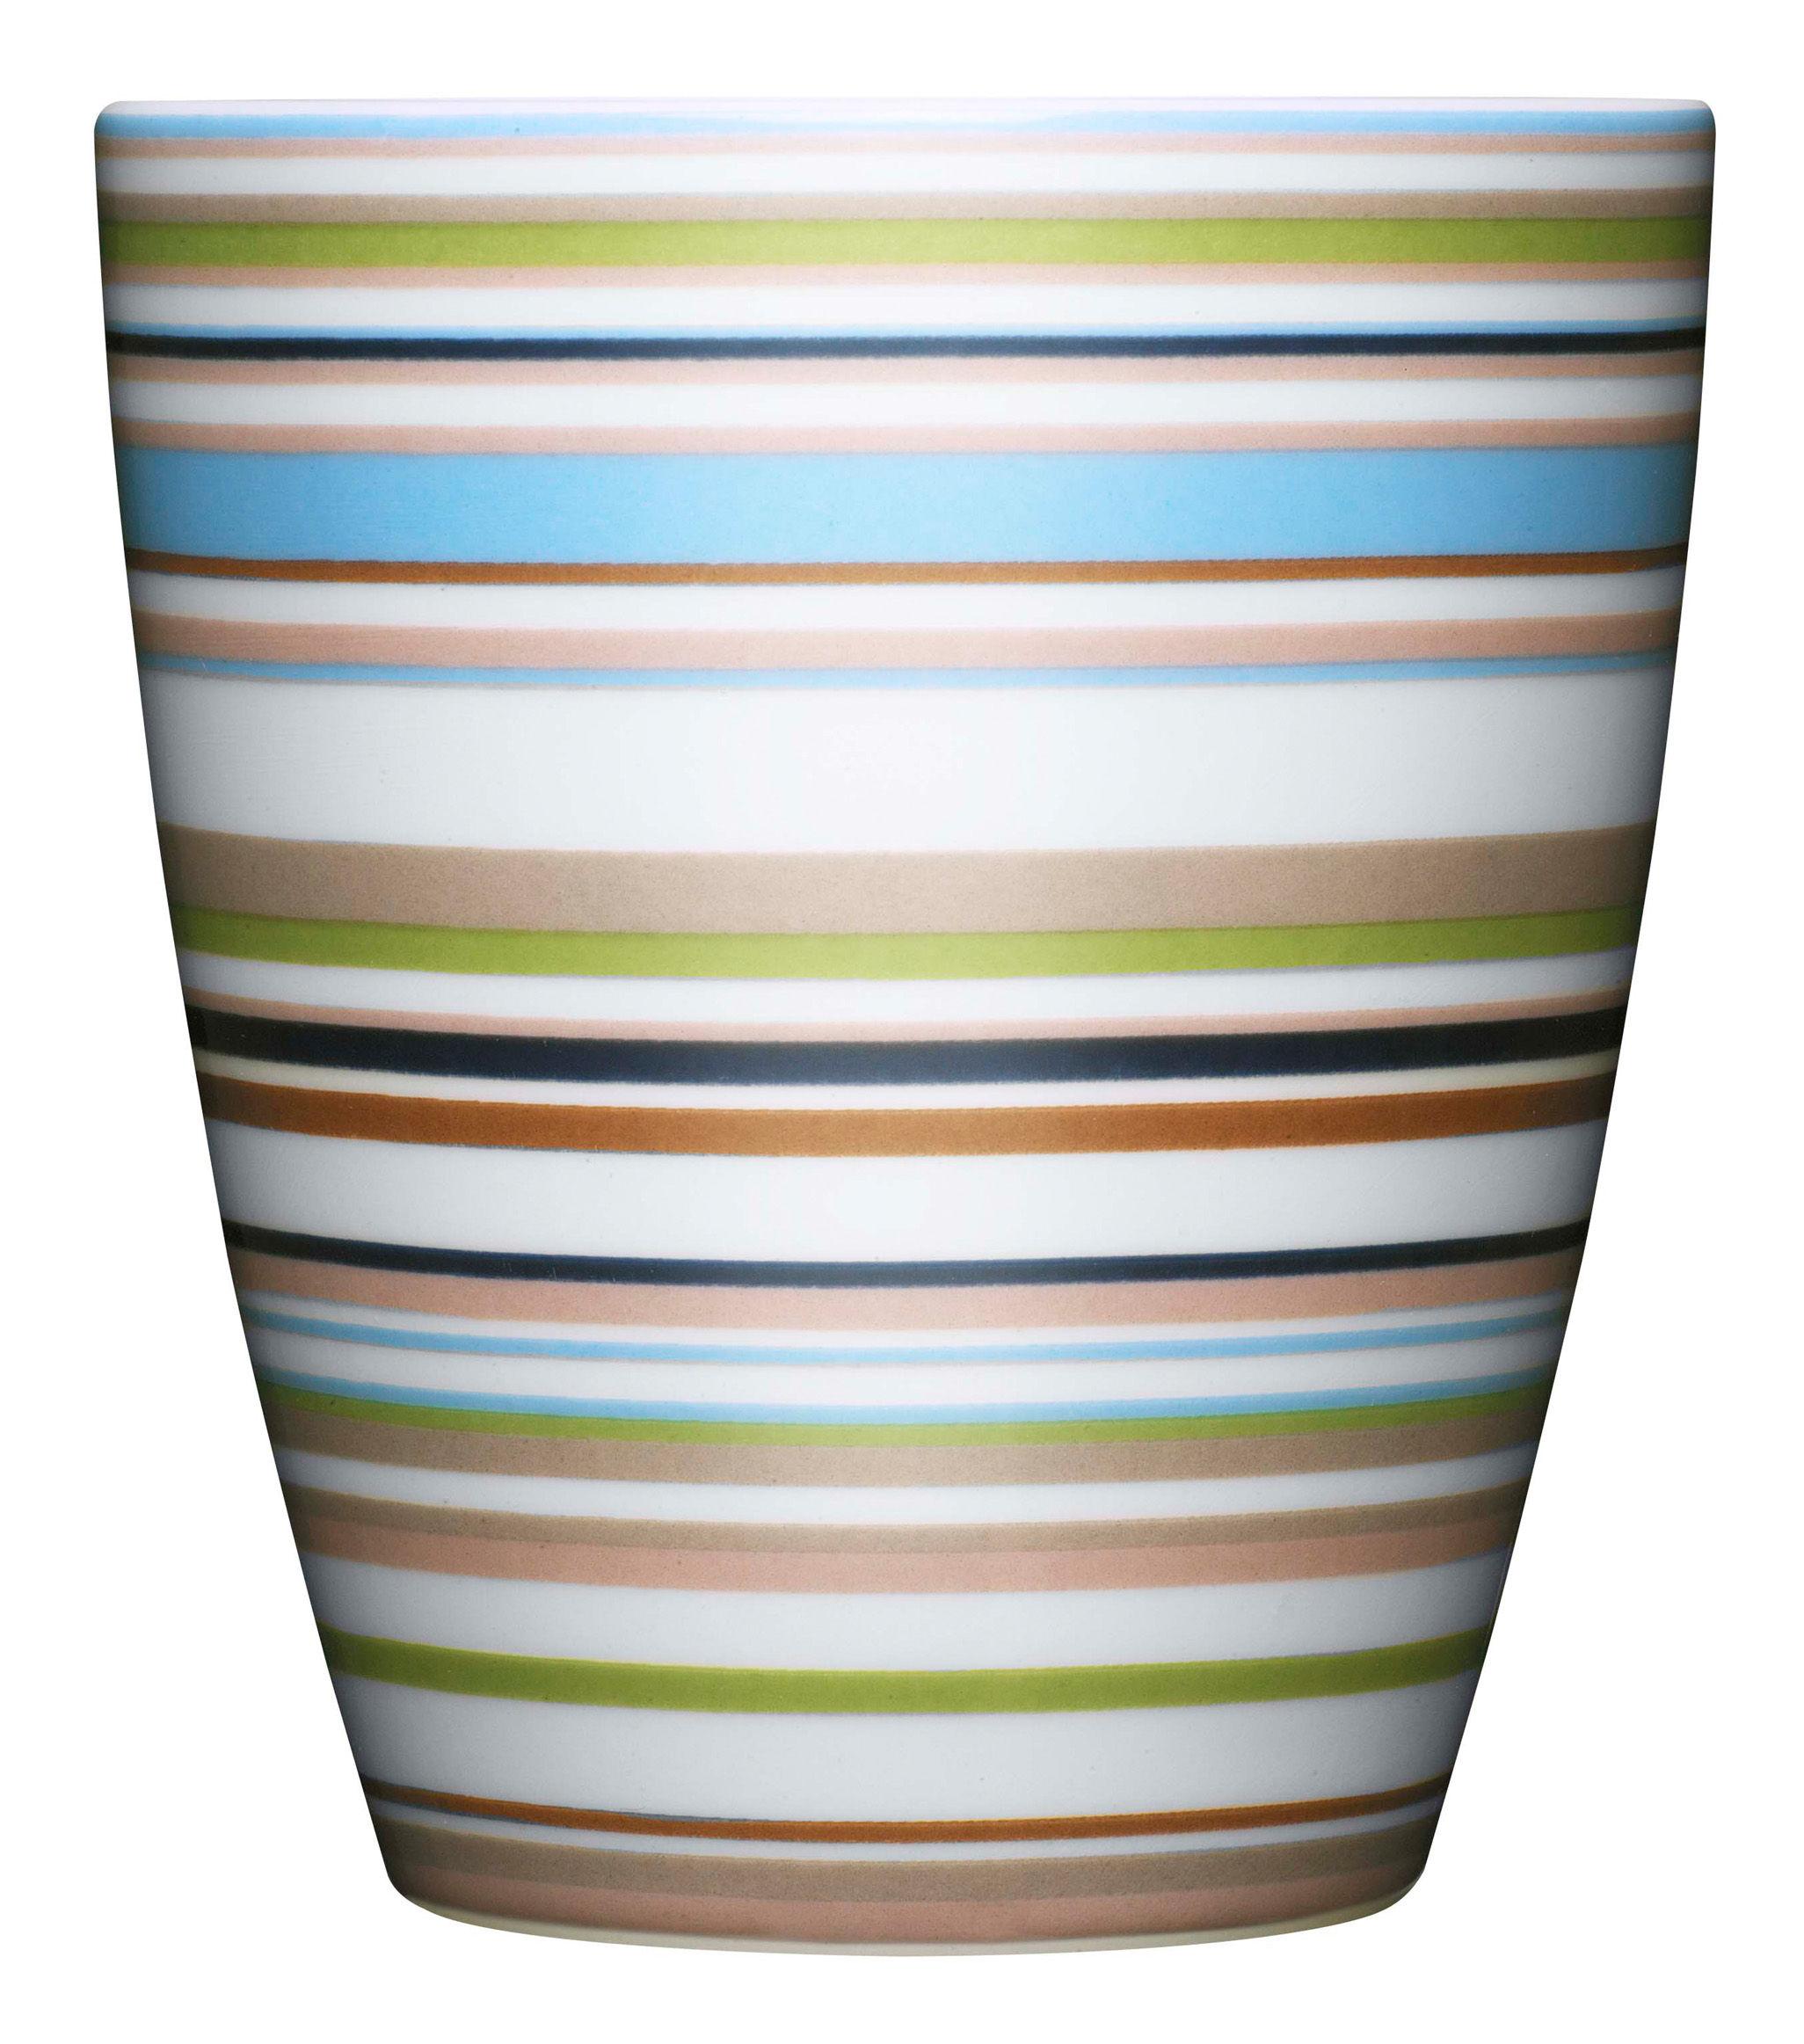 Arts de la table - Tasses et mugs - Mug Origo - Iittala - Beige - Porcelaine